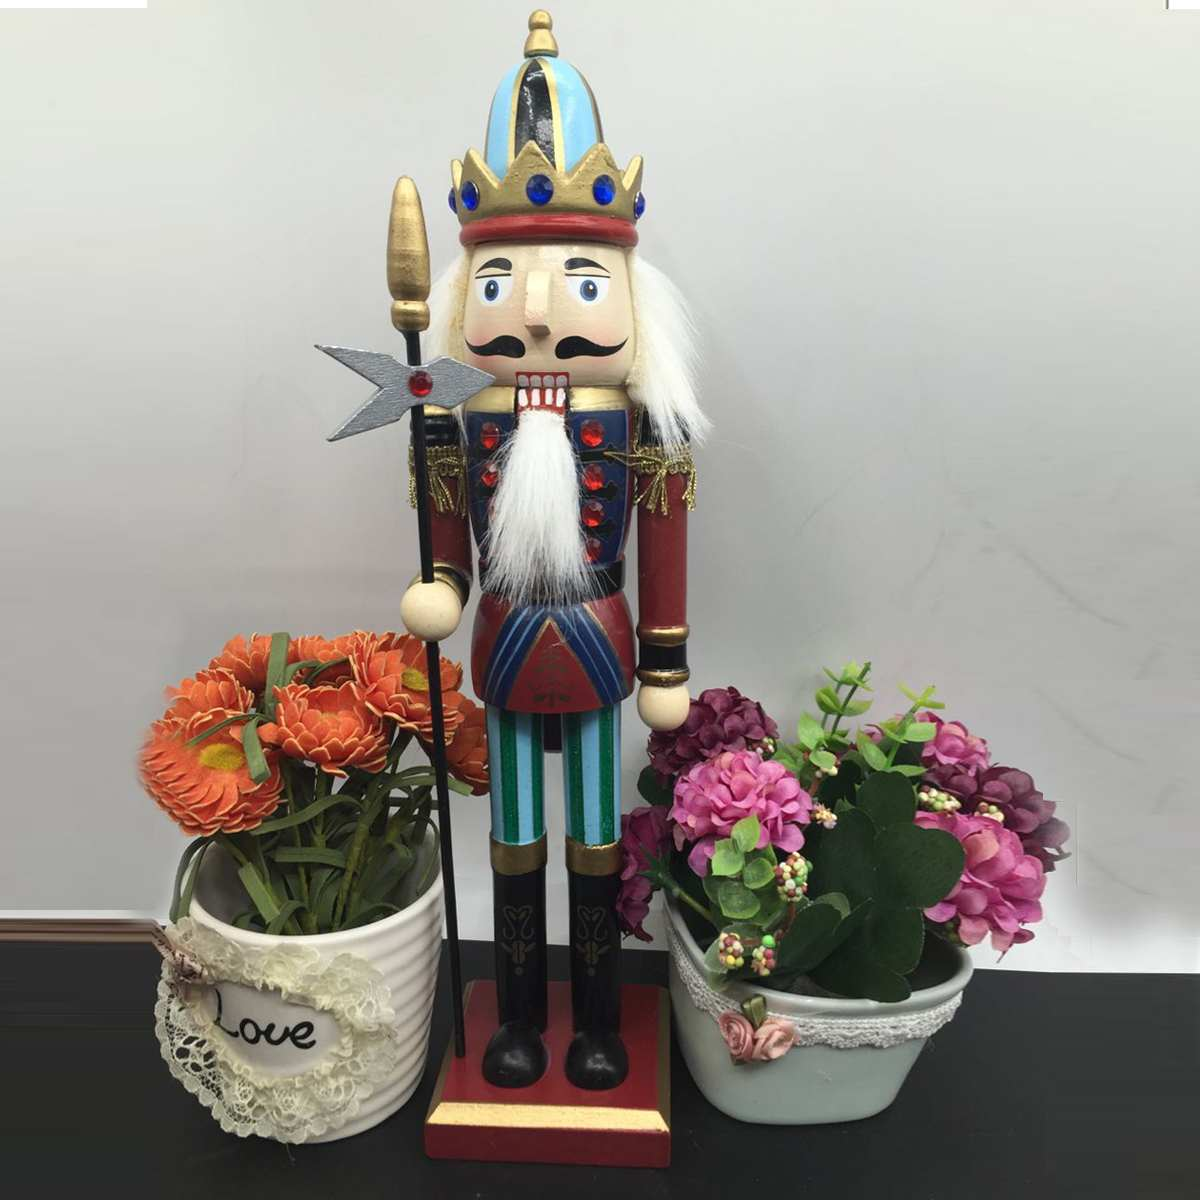 4X Wooden Nutcracker Soldier Vintage Style Handcraft Puppet Doll Decor Xmas Gift